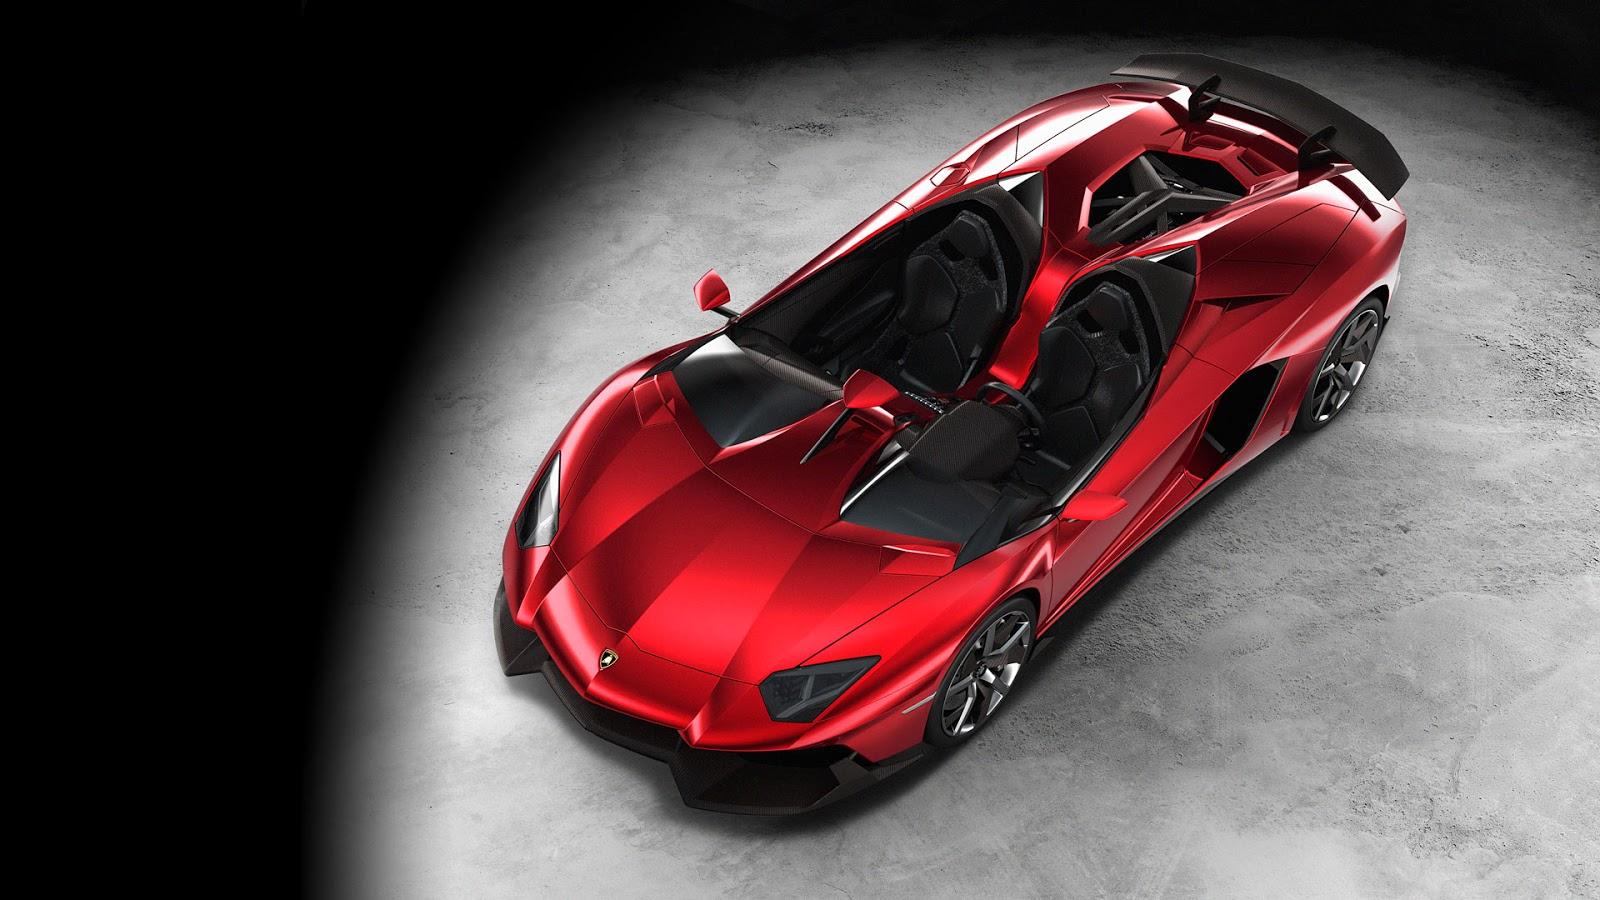 New Lamborghini Aventador J total convertible sportcar